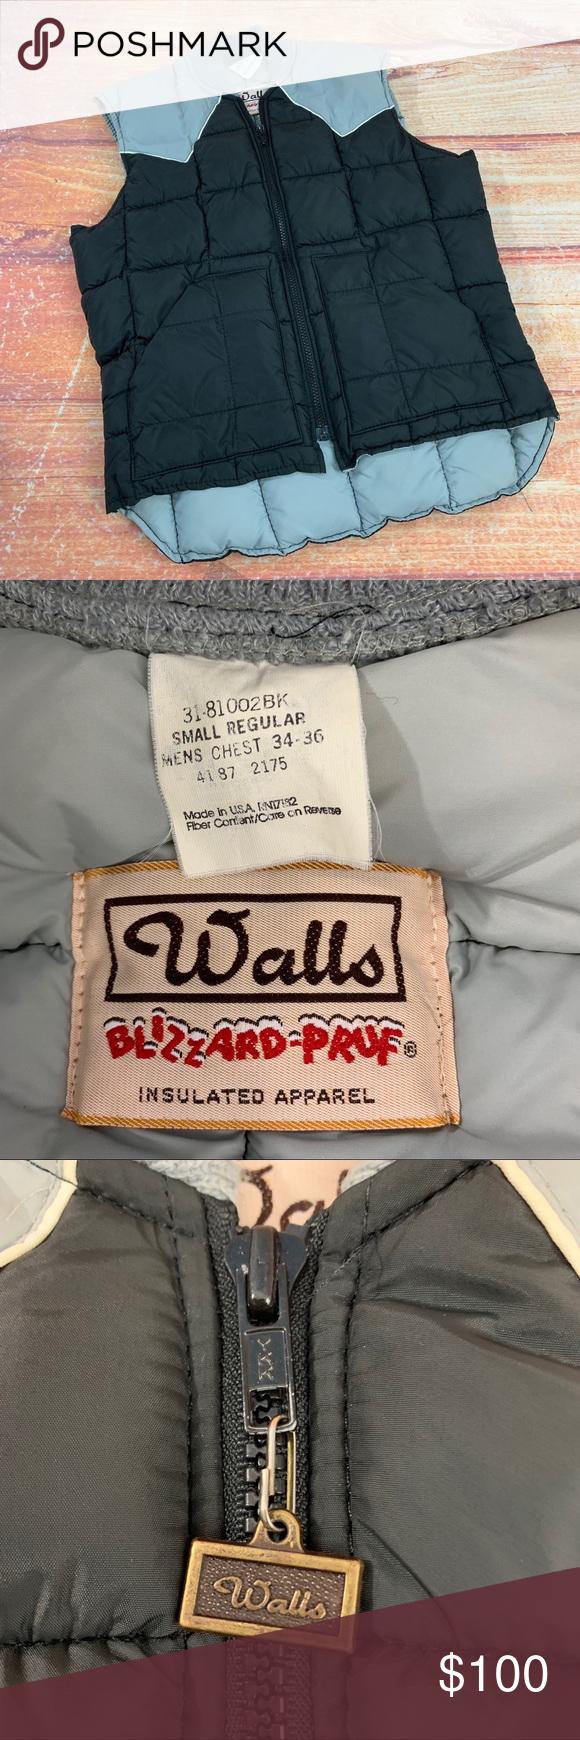 Vintage Walls Blizzard Pruf Down Vest Large Amazing Super Kool